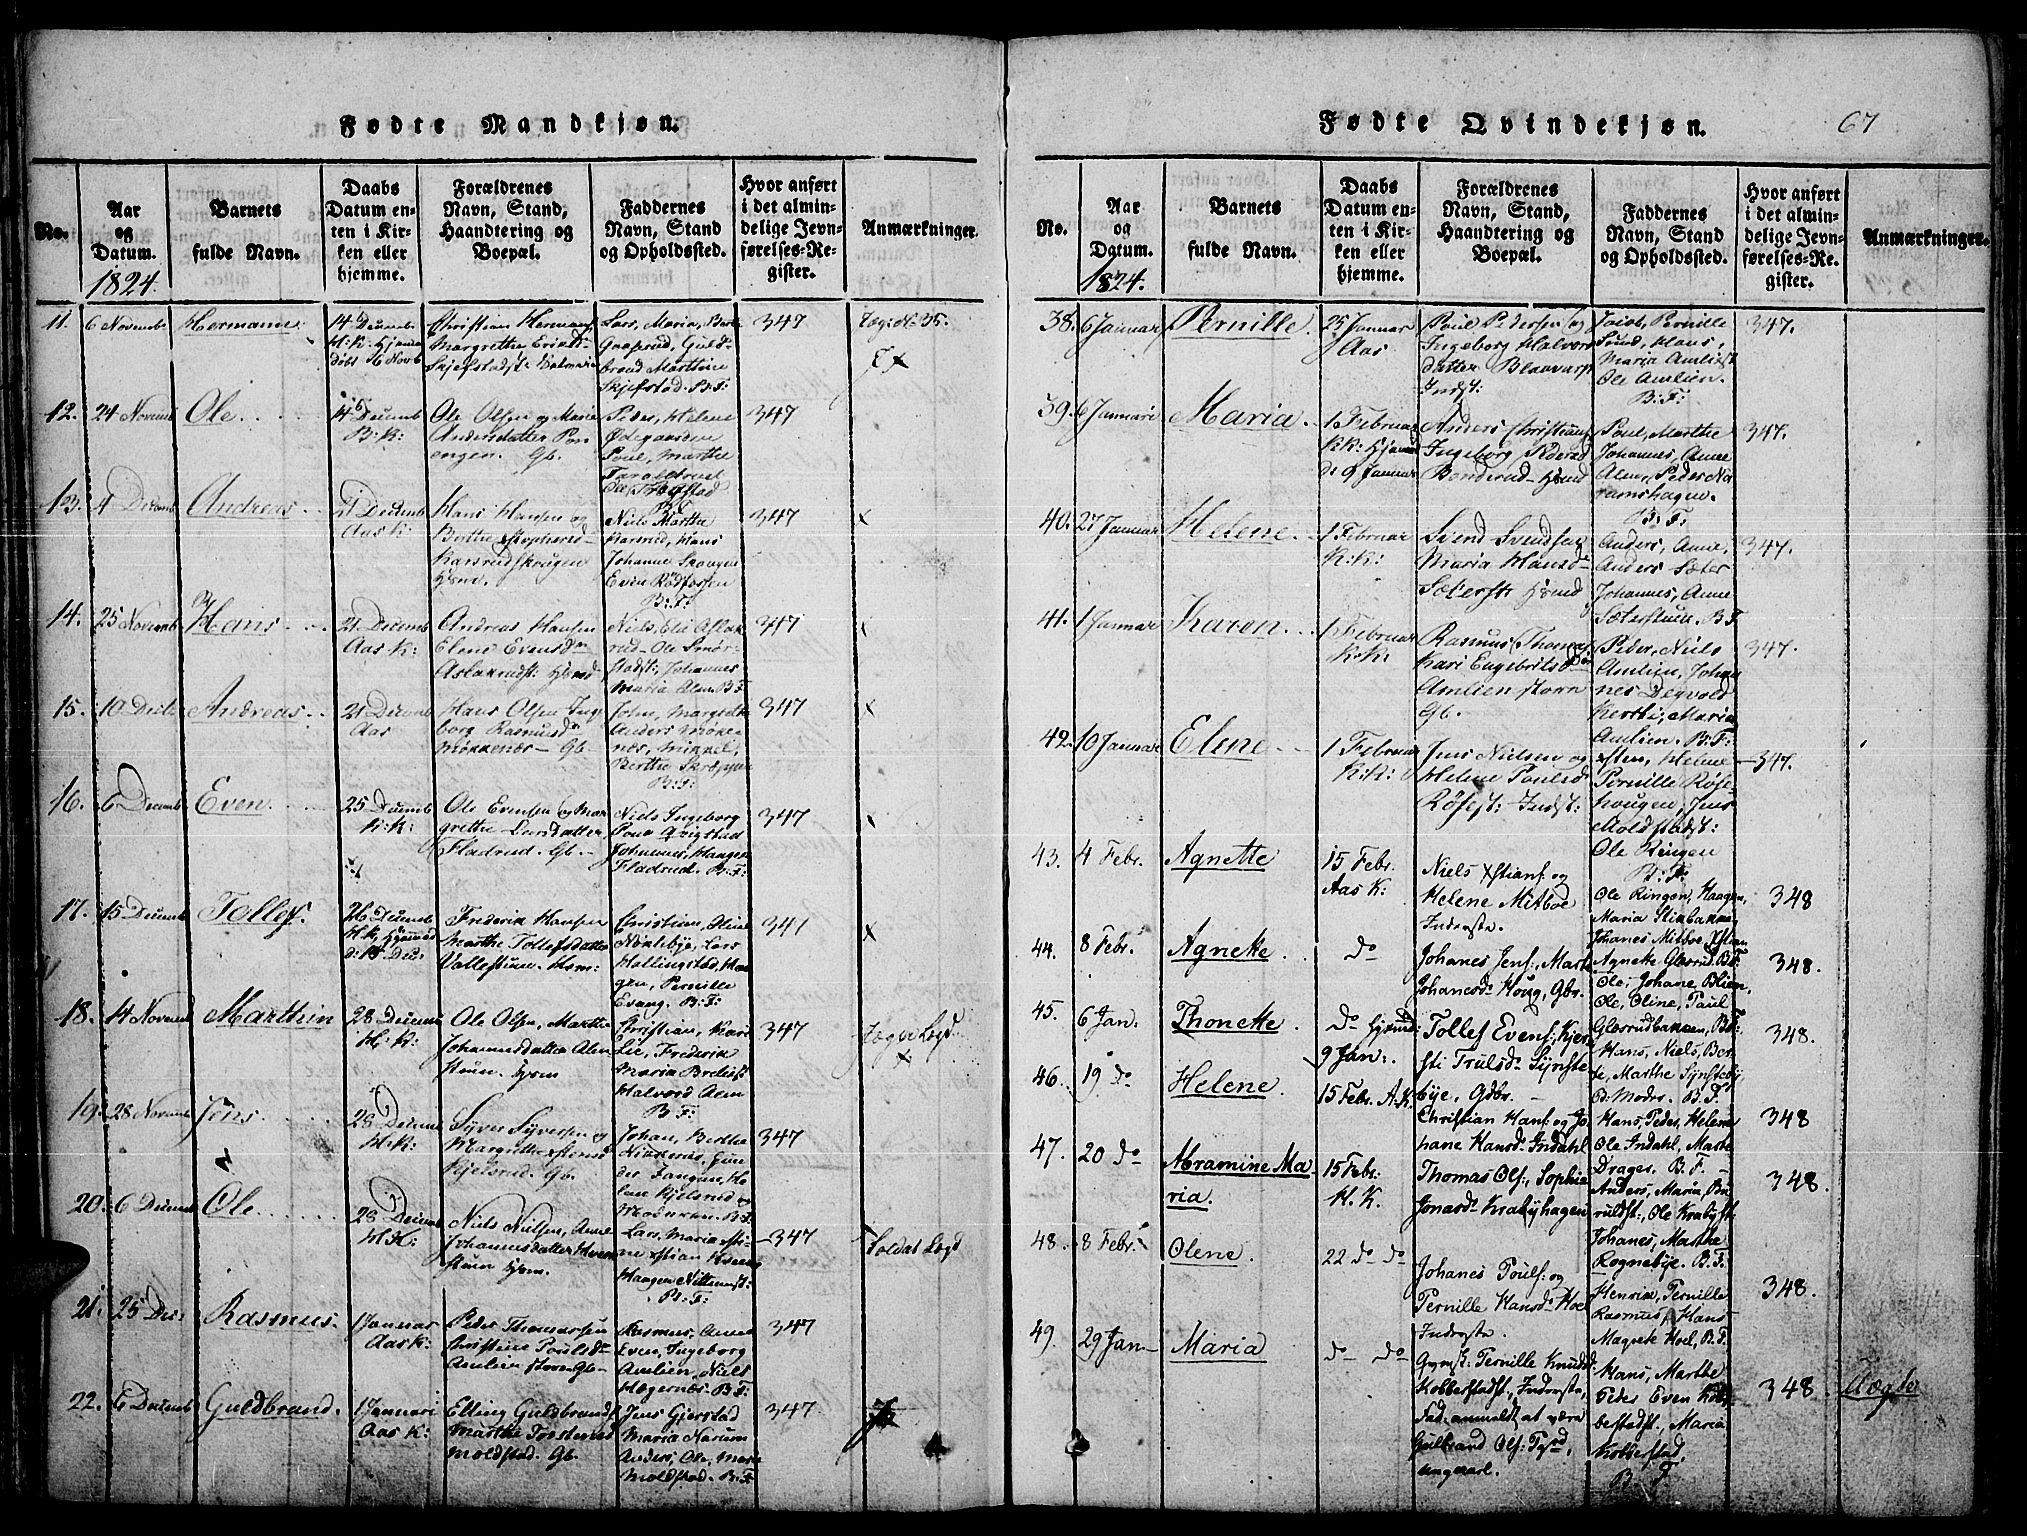 SAH, Toten prestekontor, Ministerialbok nr. 10, 1820-1828, s. 67